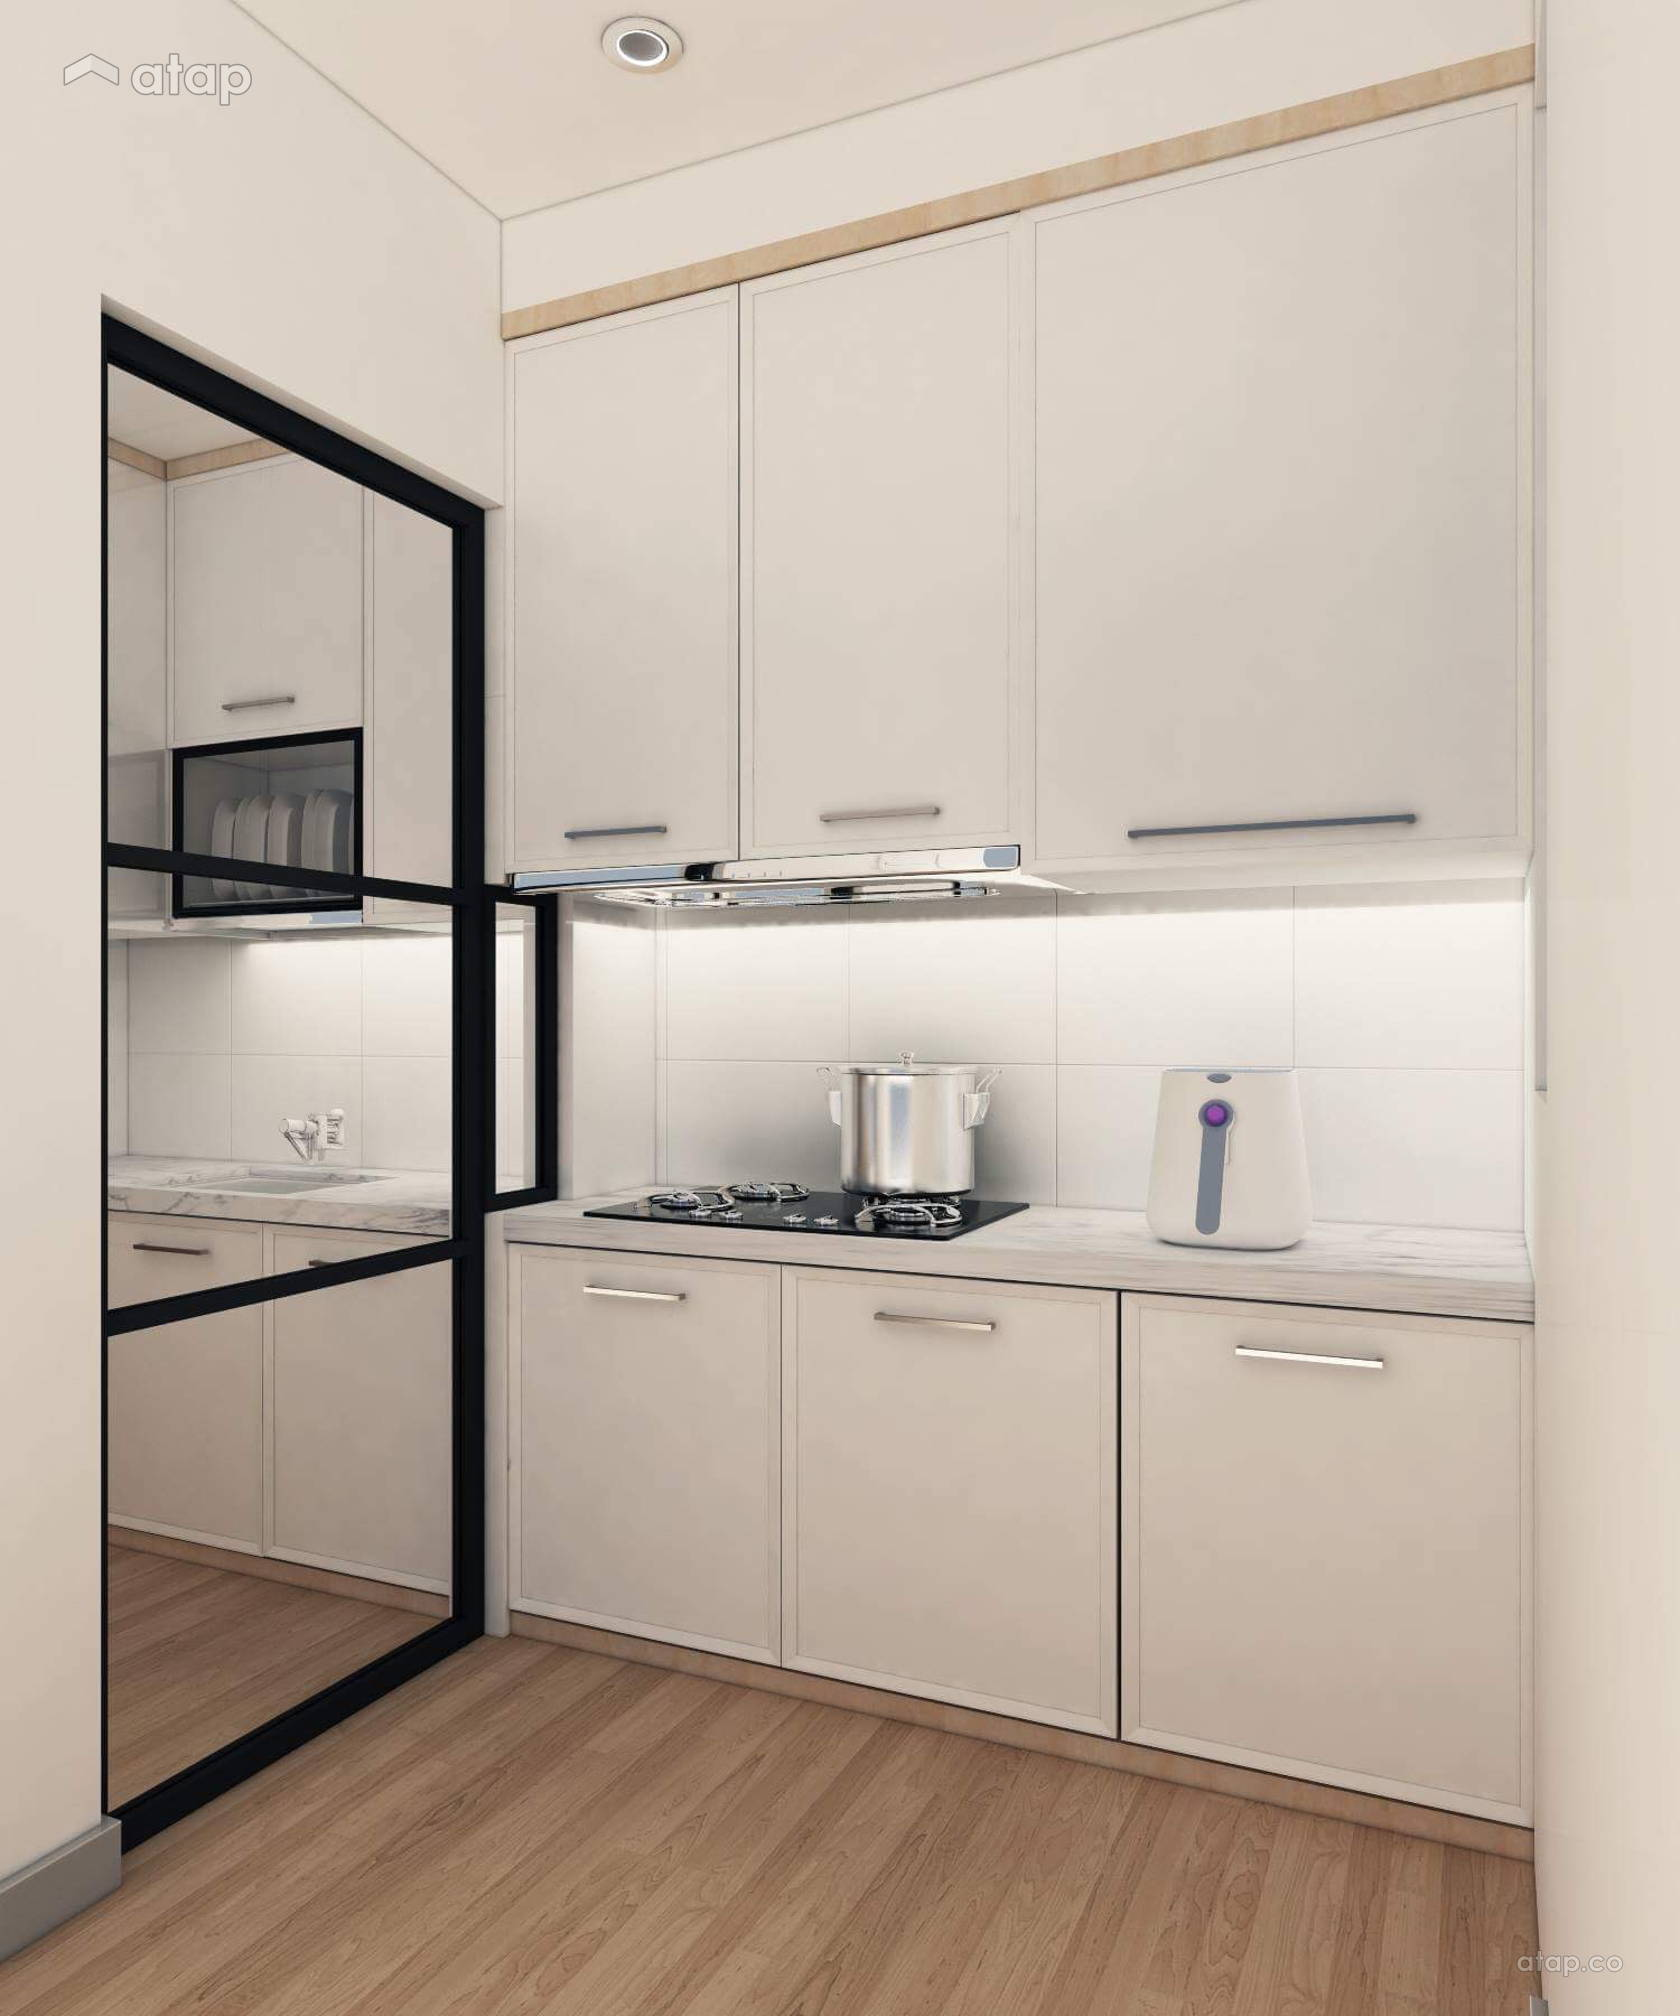 Japanese Inspired Kitchen Design: Kitchen Condominium Design Ideas & Photos Malaysia